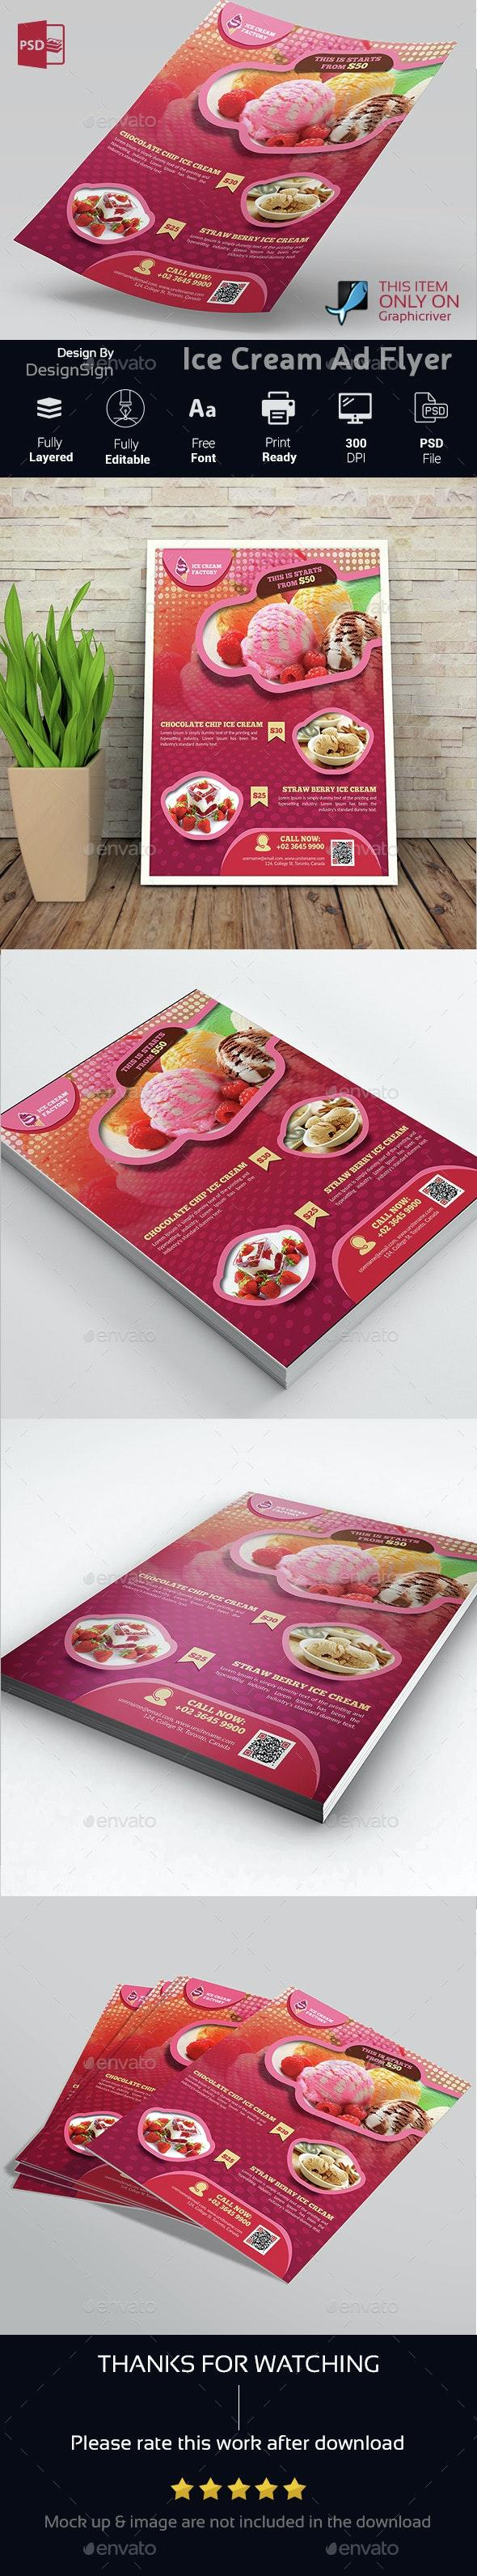 Ice Cream Ad Flyer - Restaurant Flyers